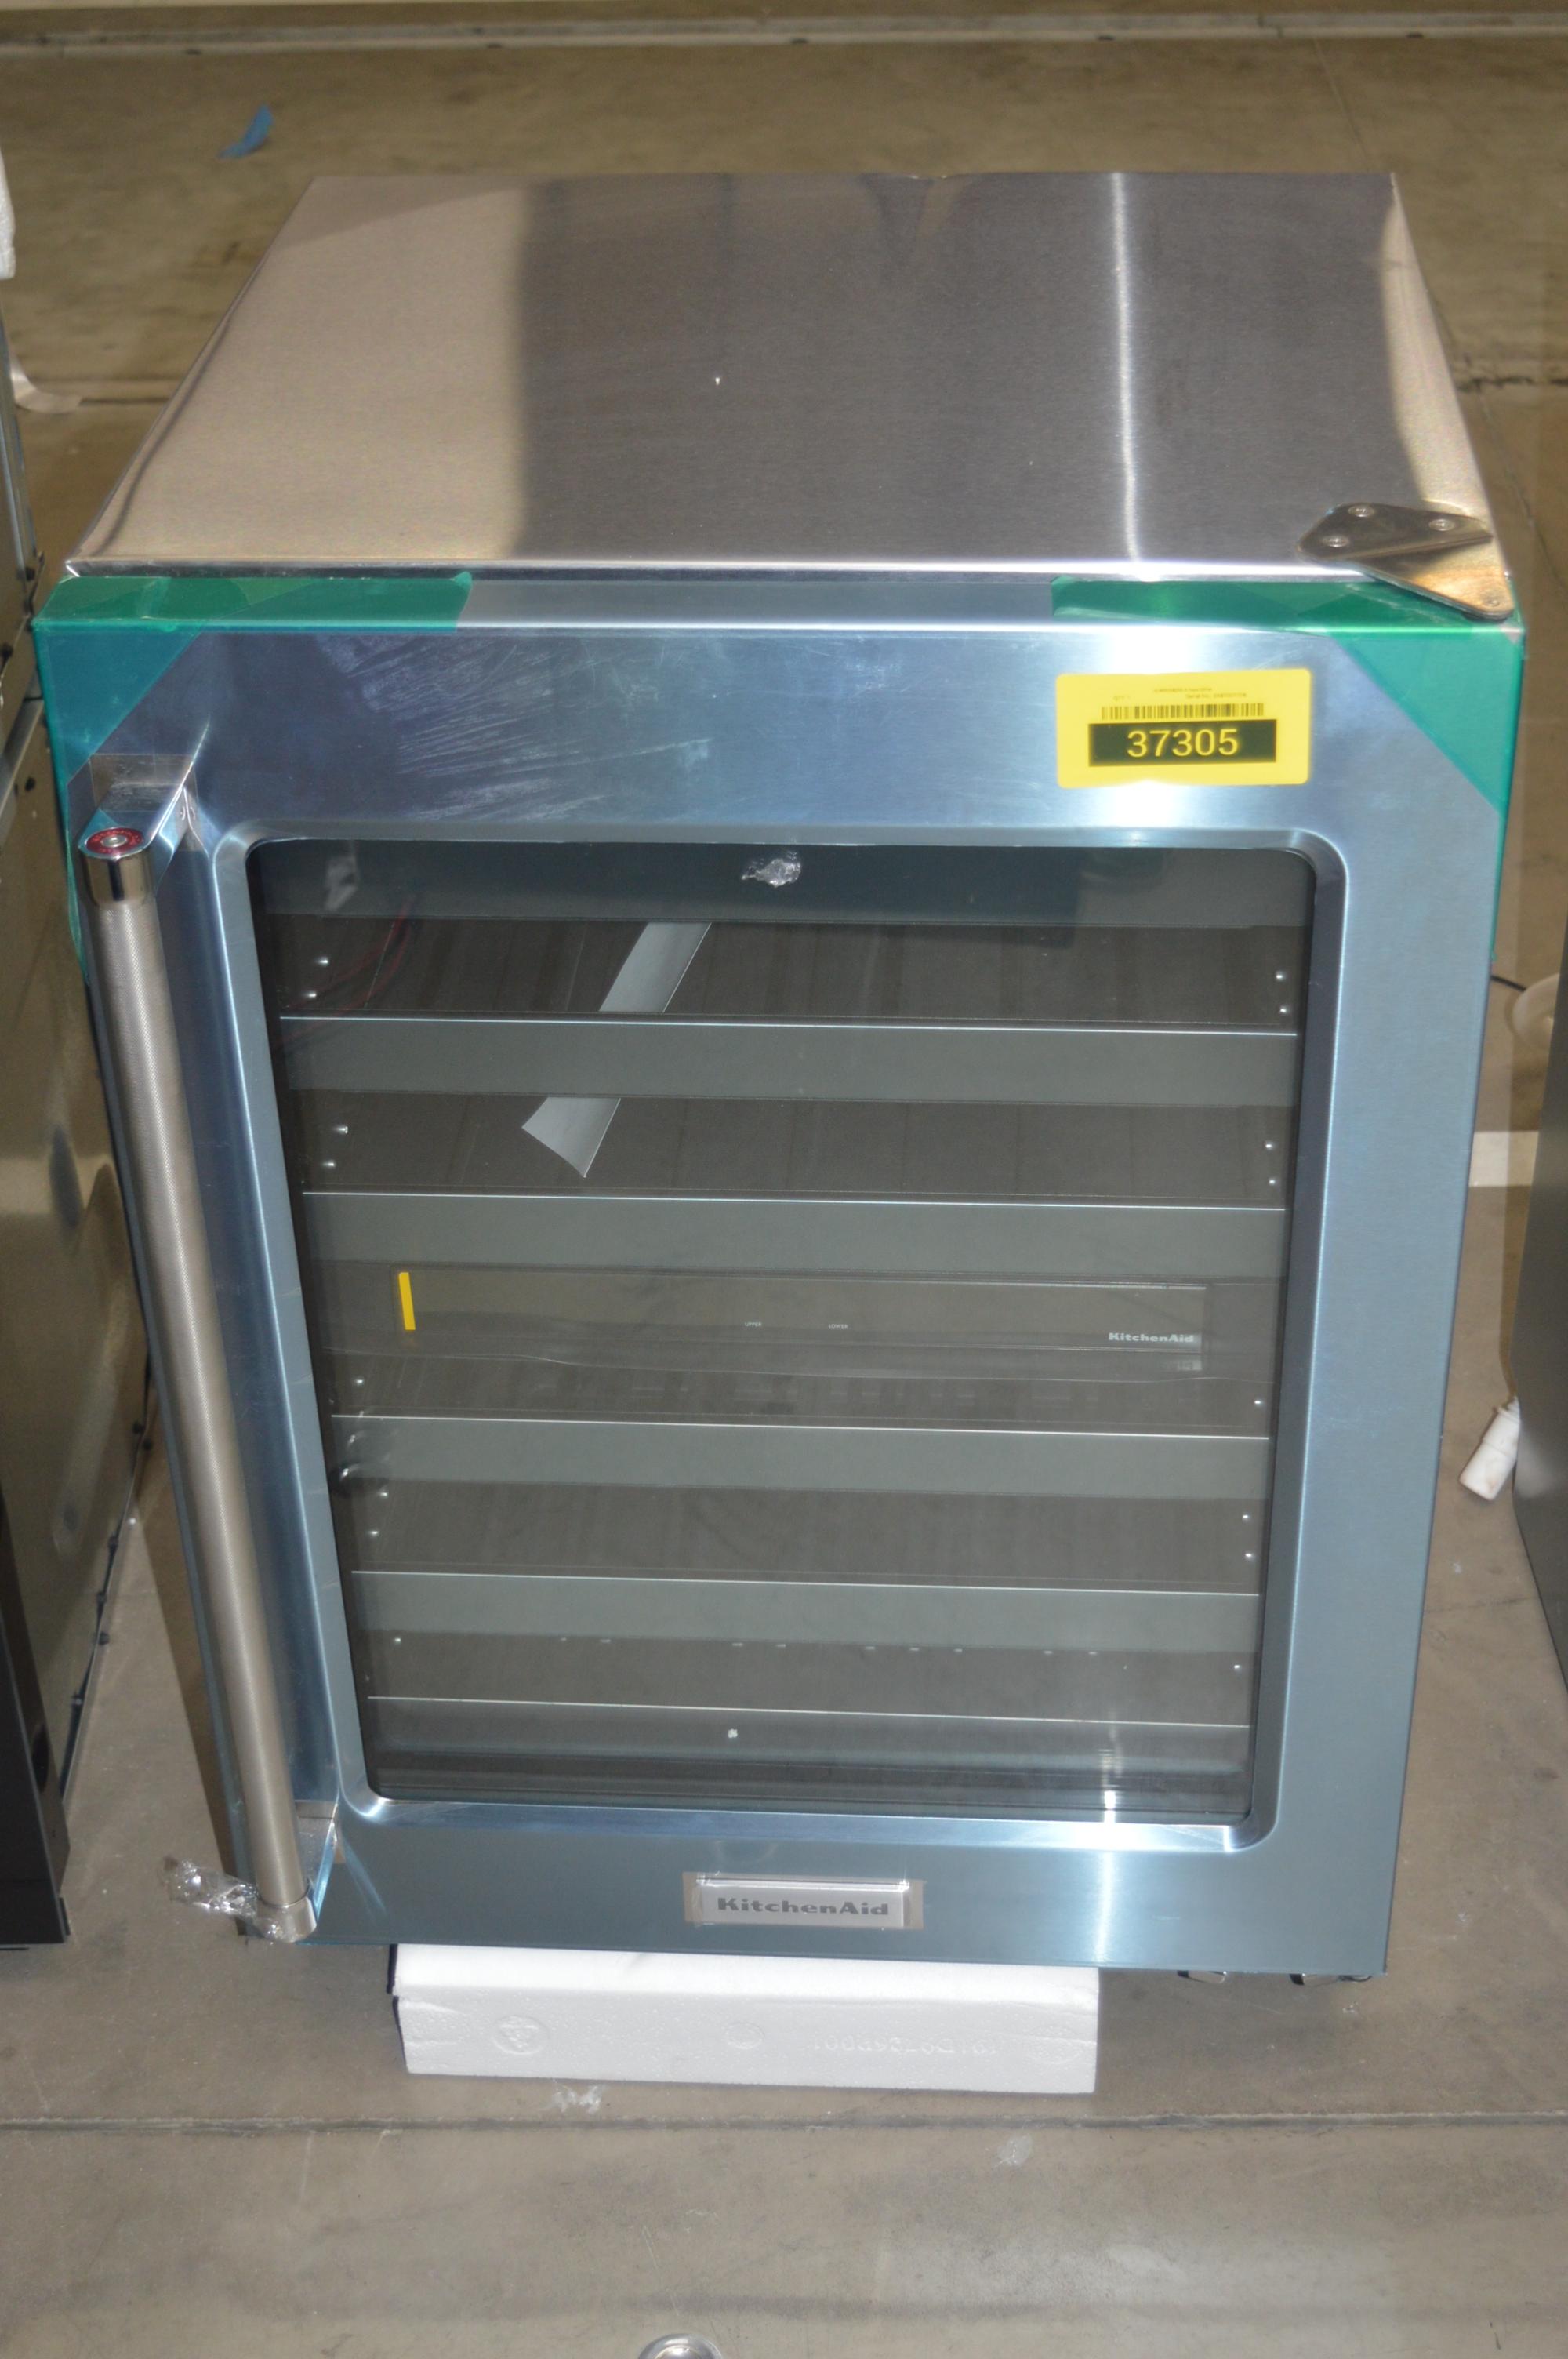 KitchenAid KUWR304ESS 24